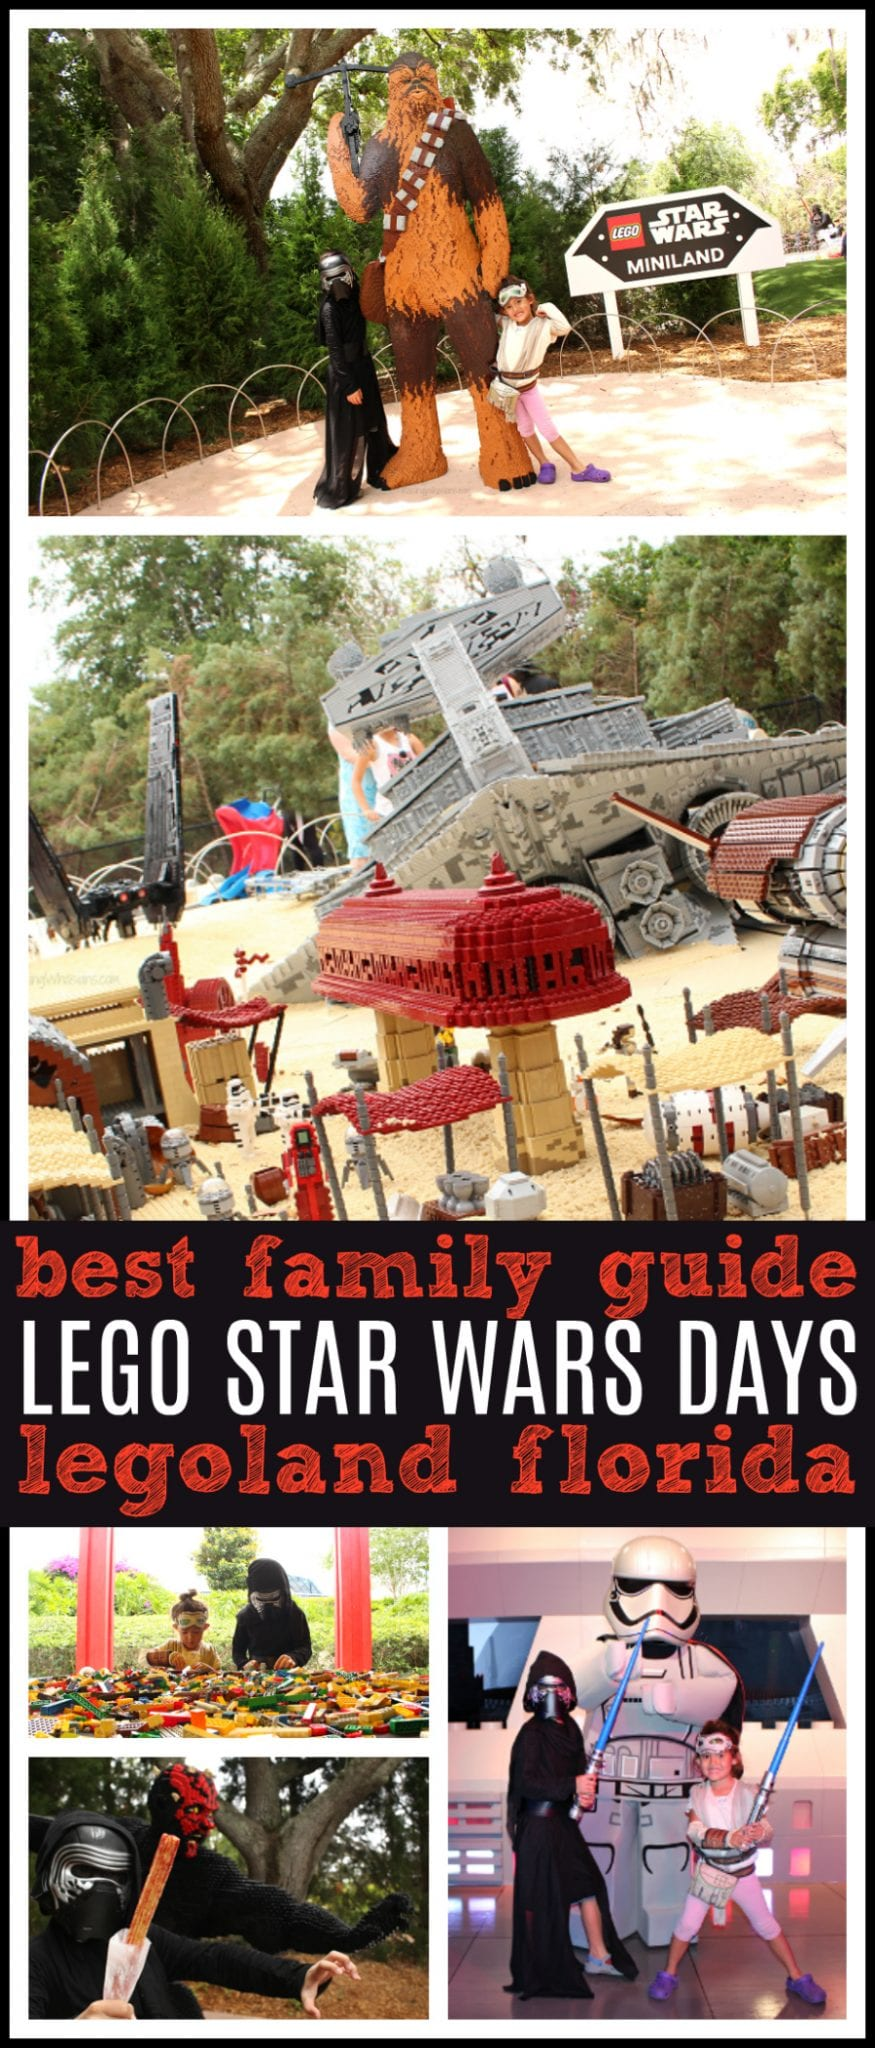 Lego star wars days guide